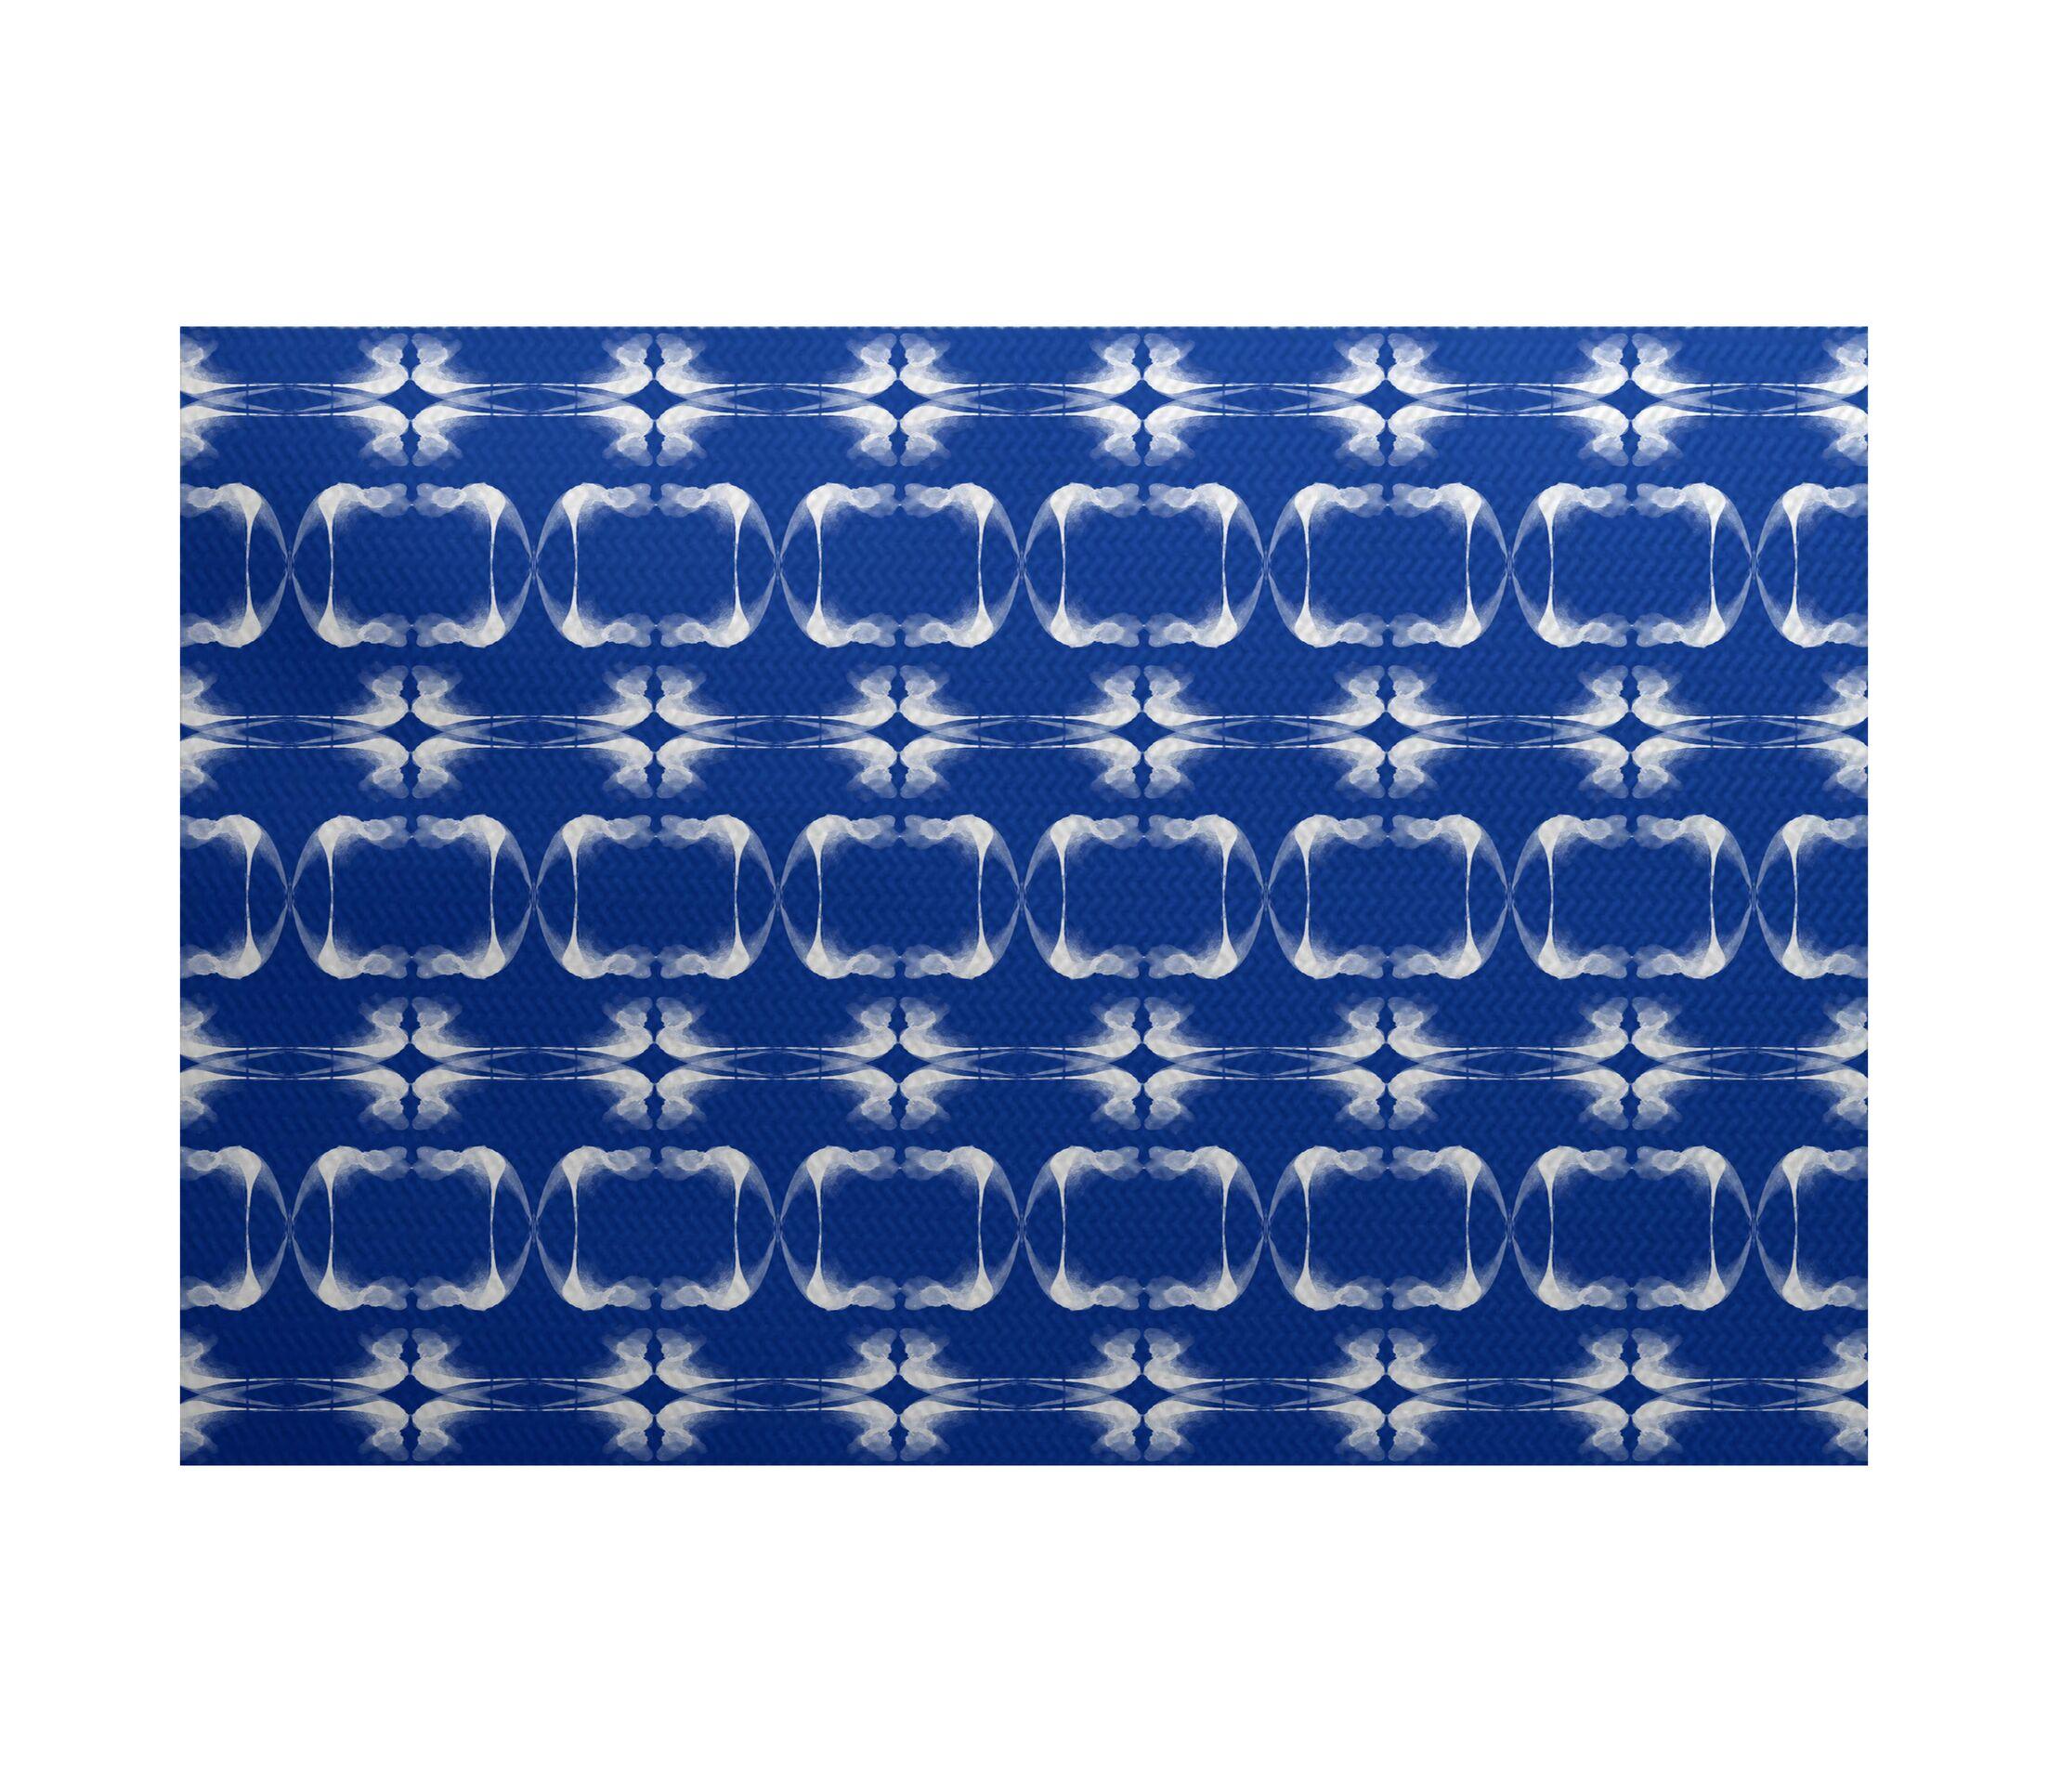 Golden Gate Blue Indoor/Outdoor Area Rug Rug Size: Rectangle 3' x 5'